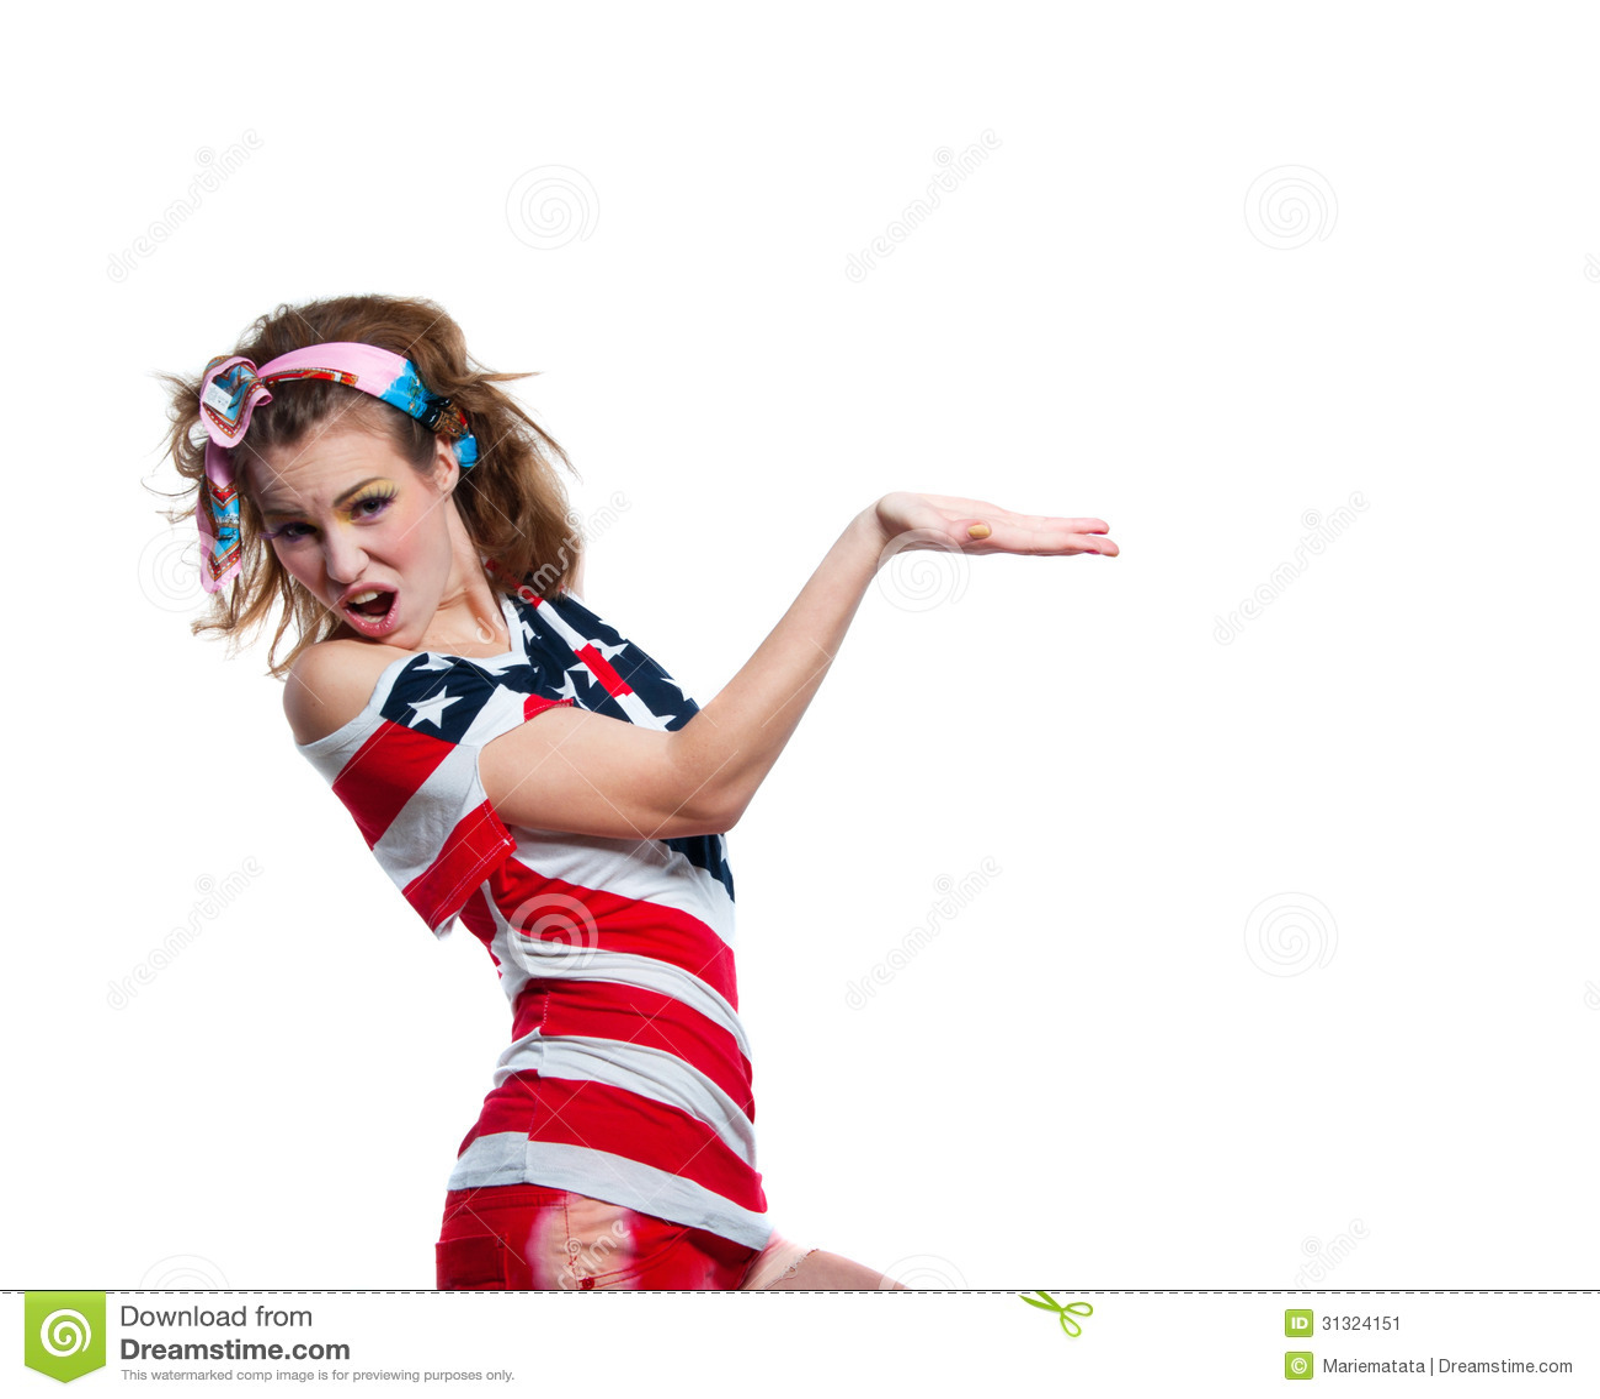 zooskool美国女孩_呼喊的美国女孩